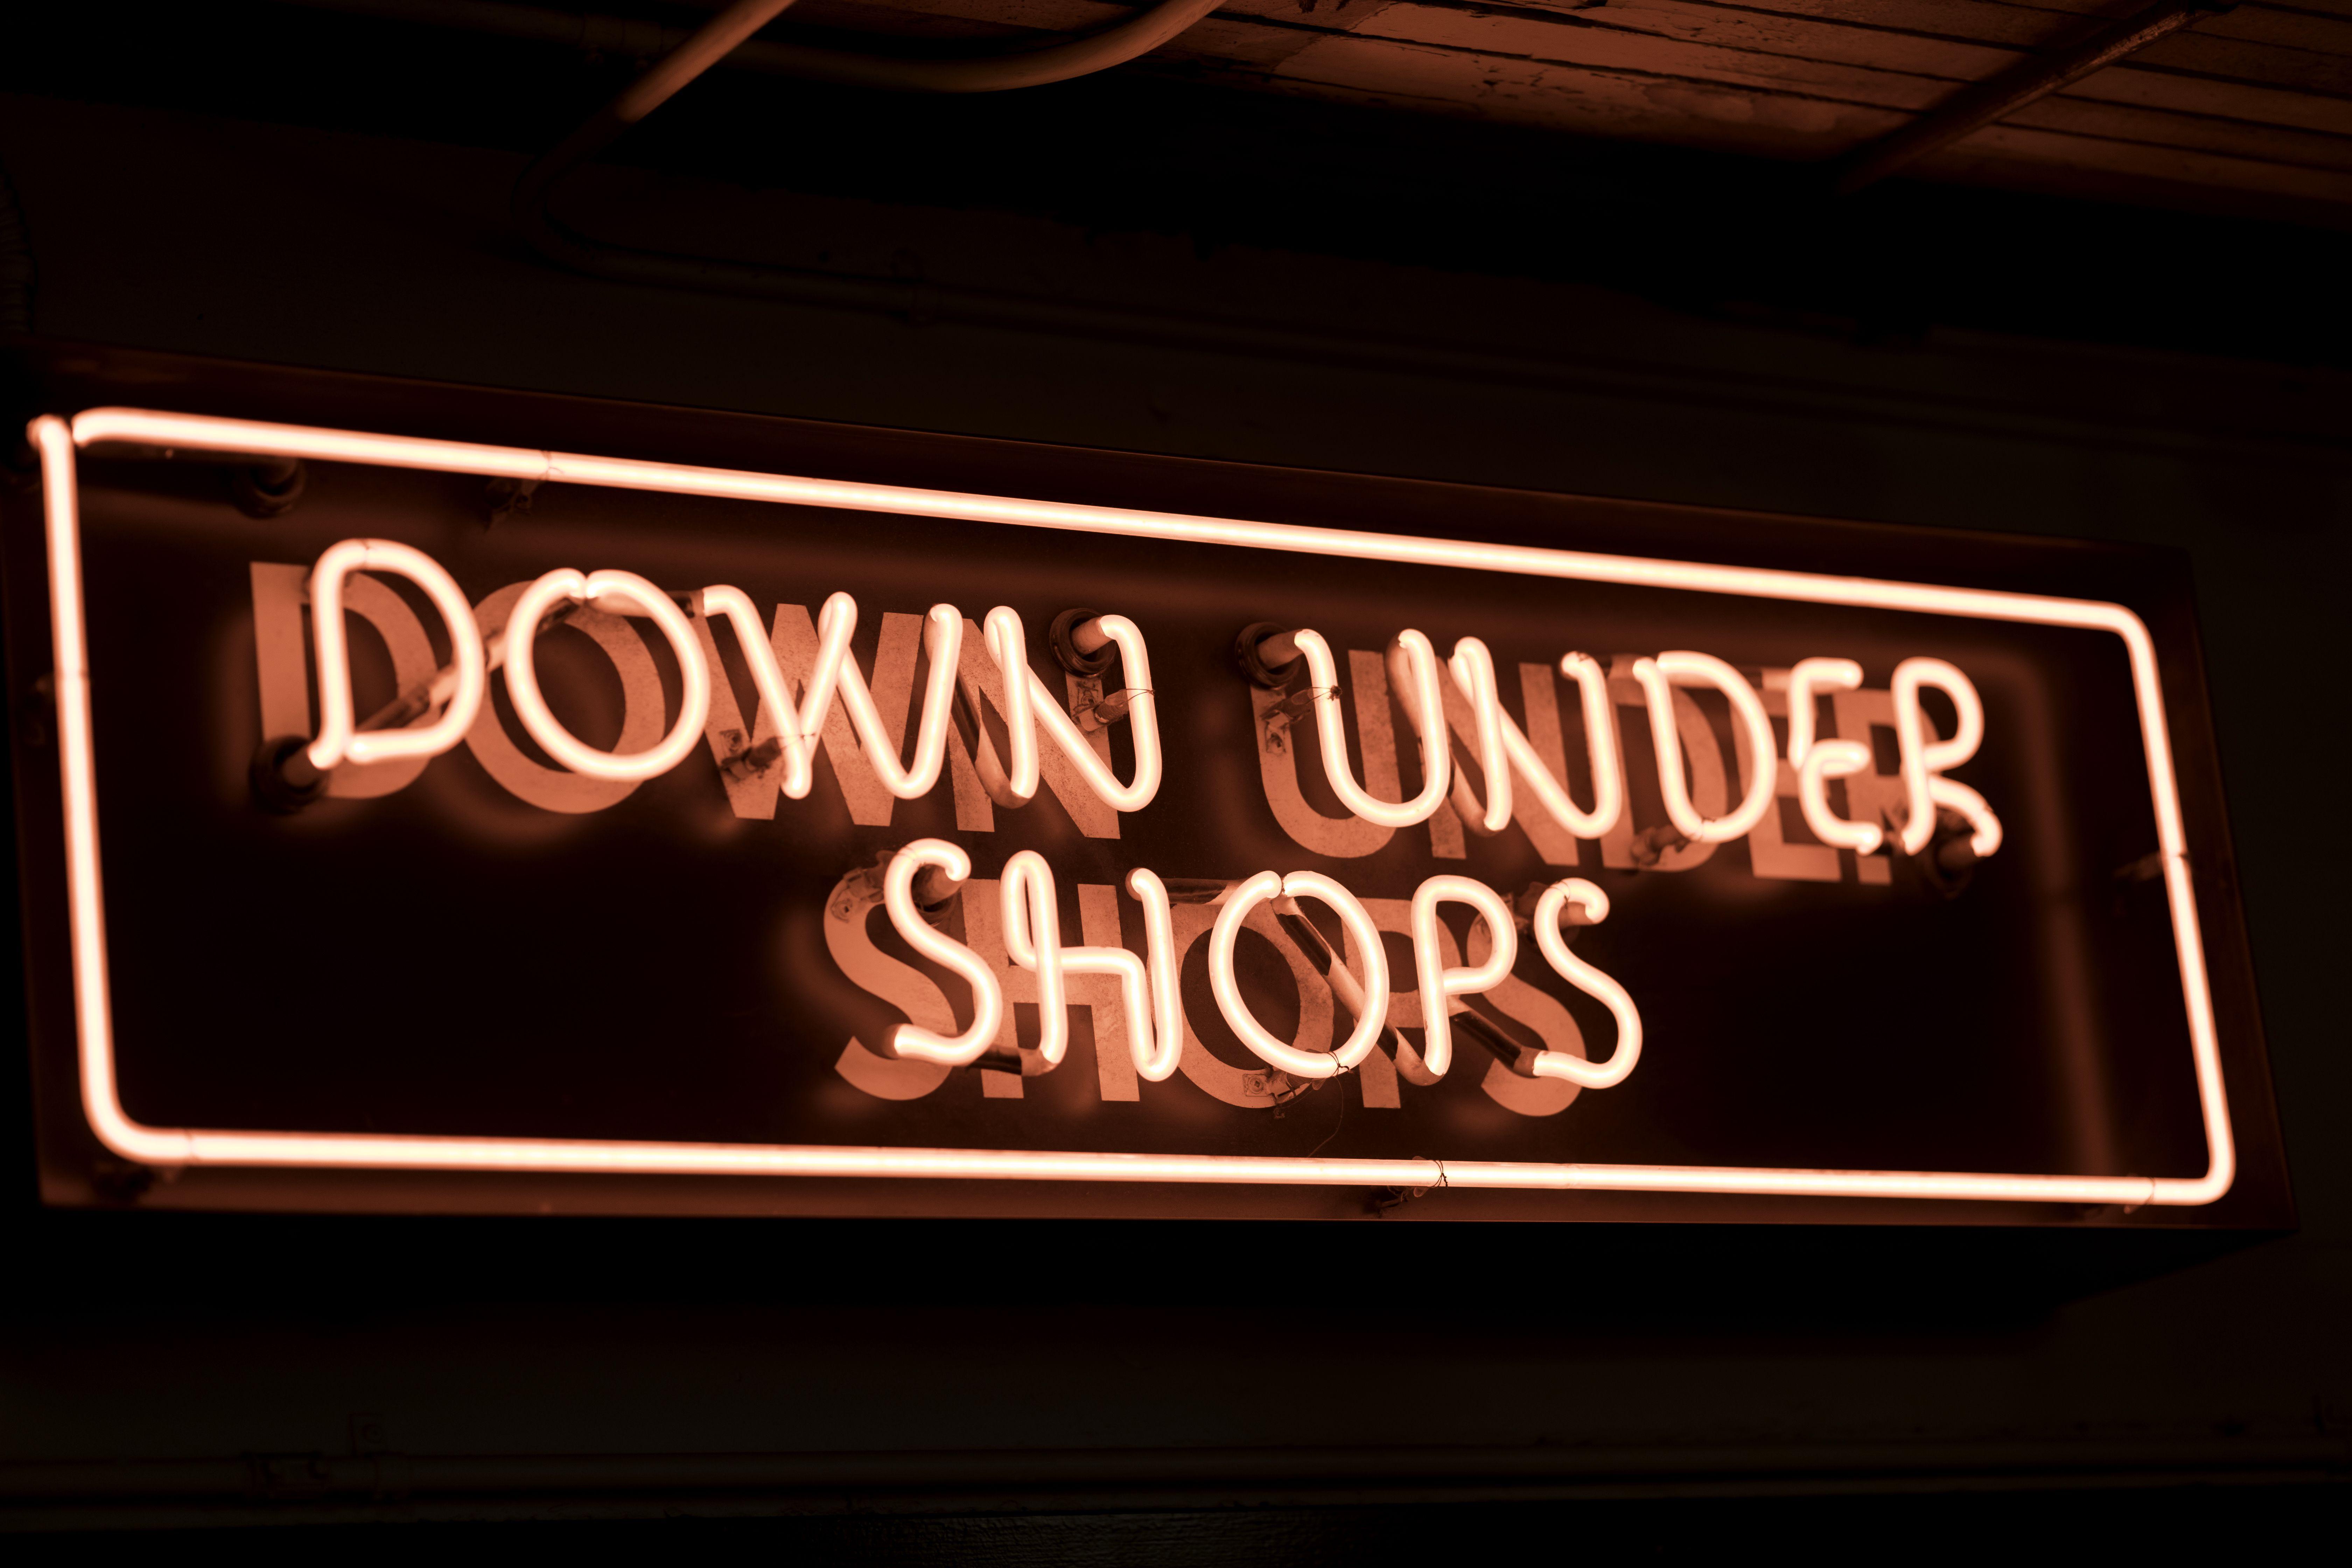 Red, glowing neon shop sign. Seattle, Washington, USA.